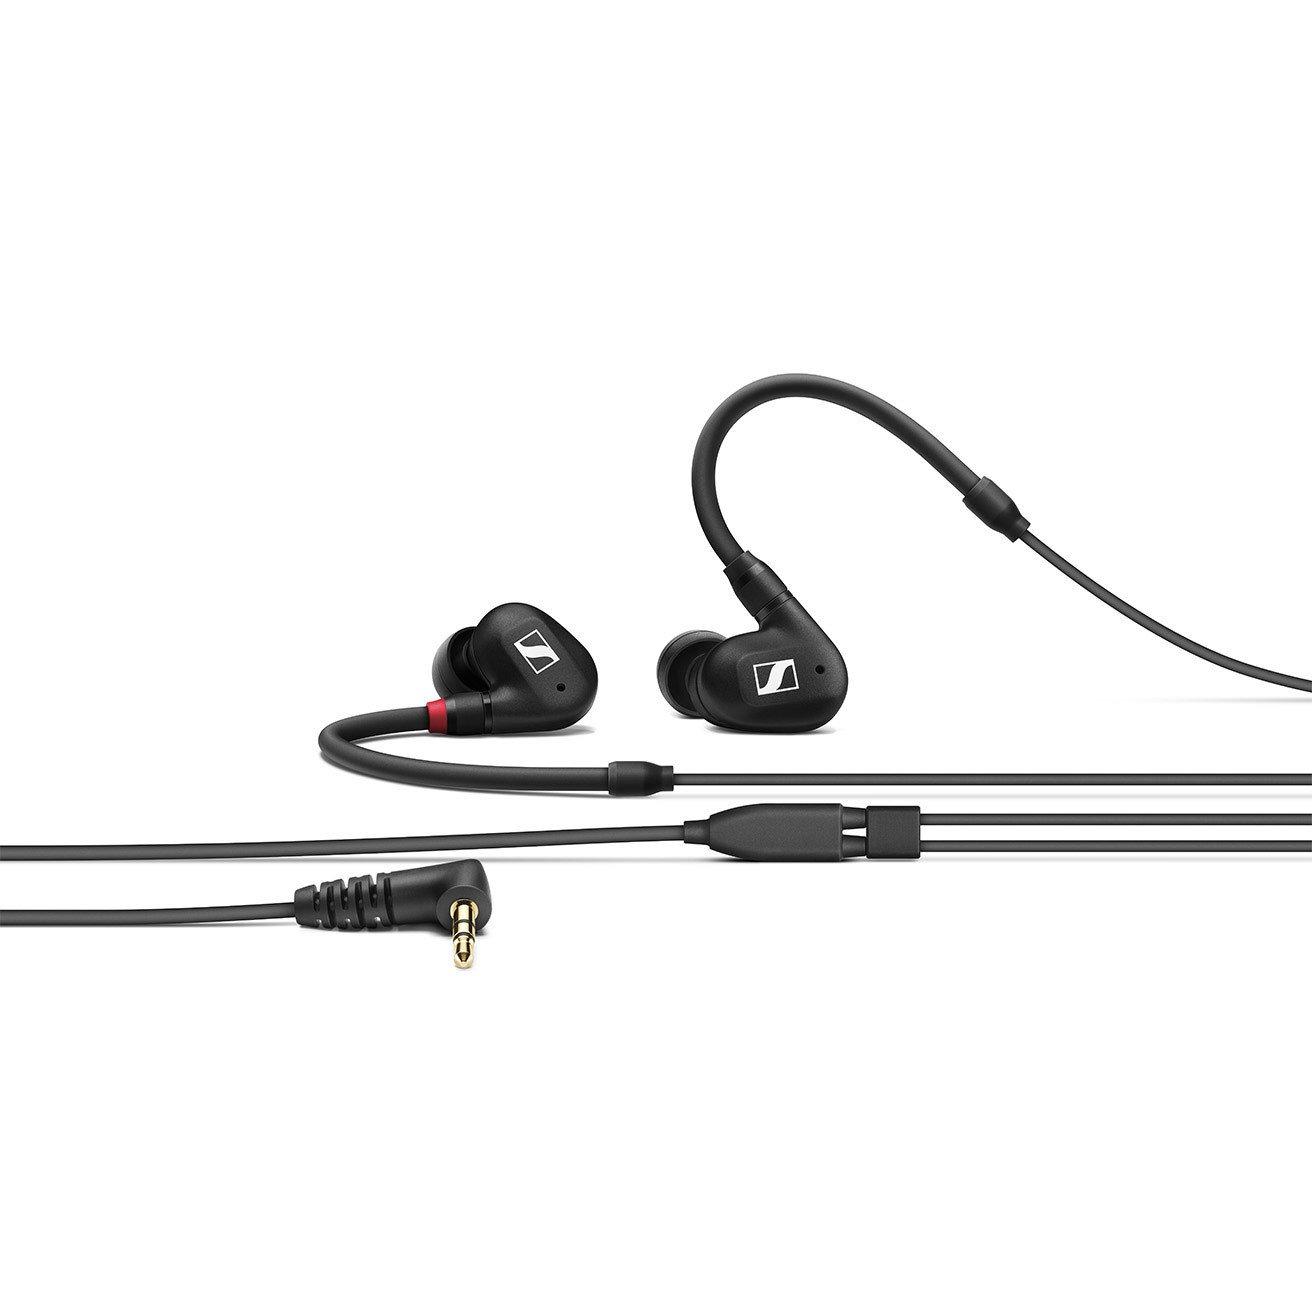 Sennheiser Ie 40 earpiece